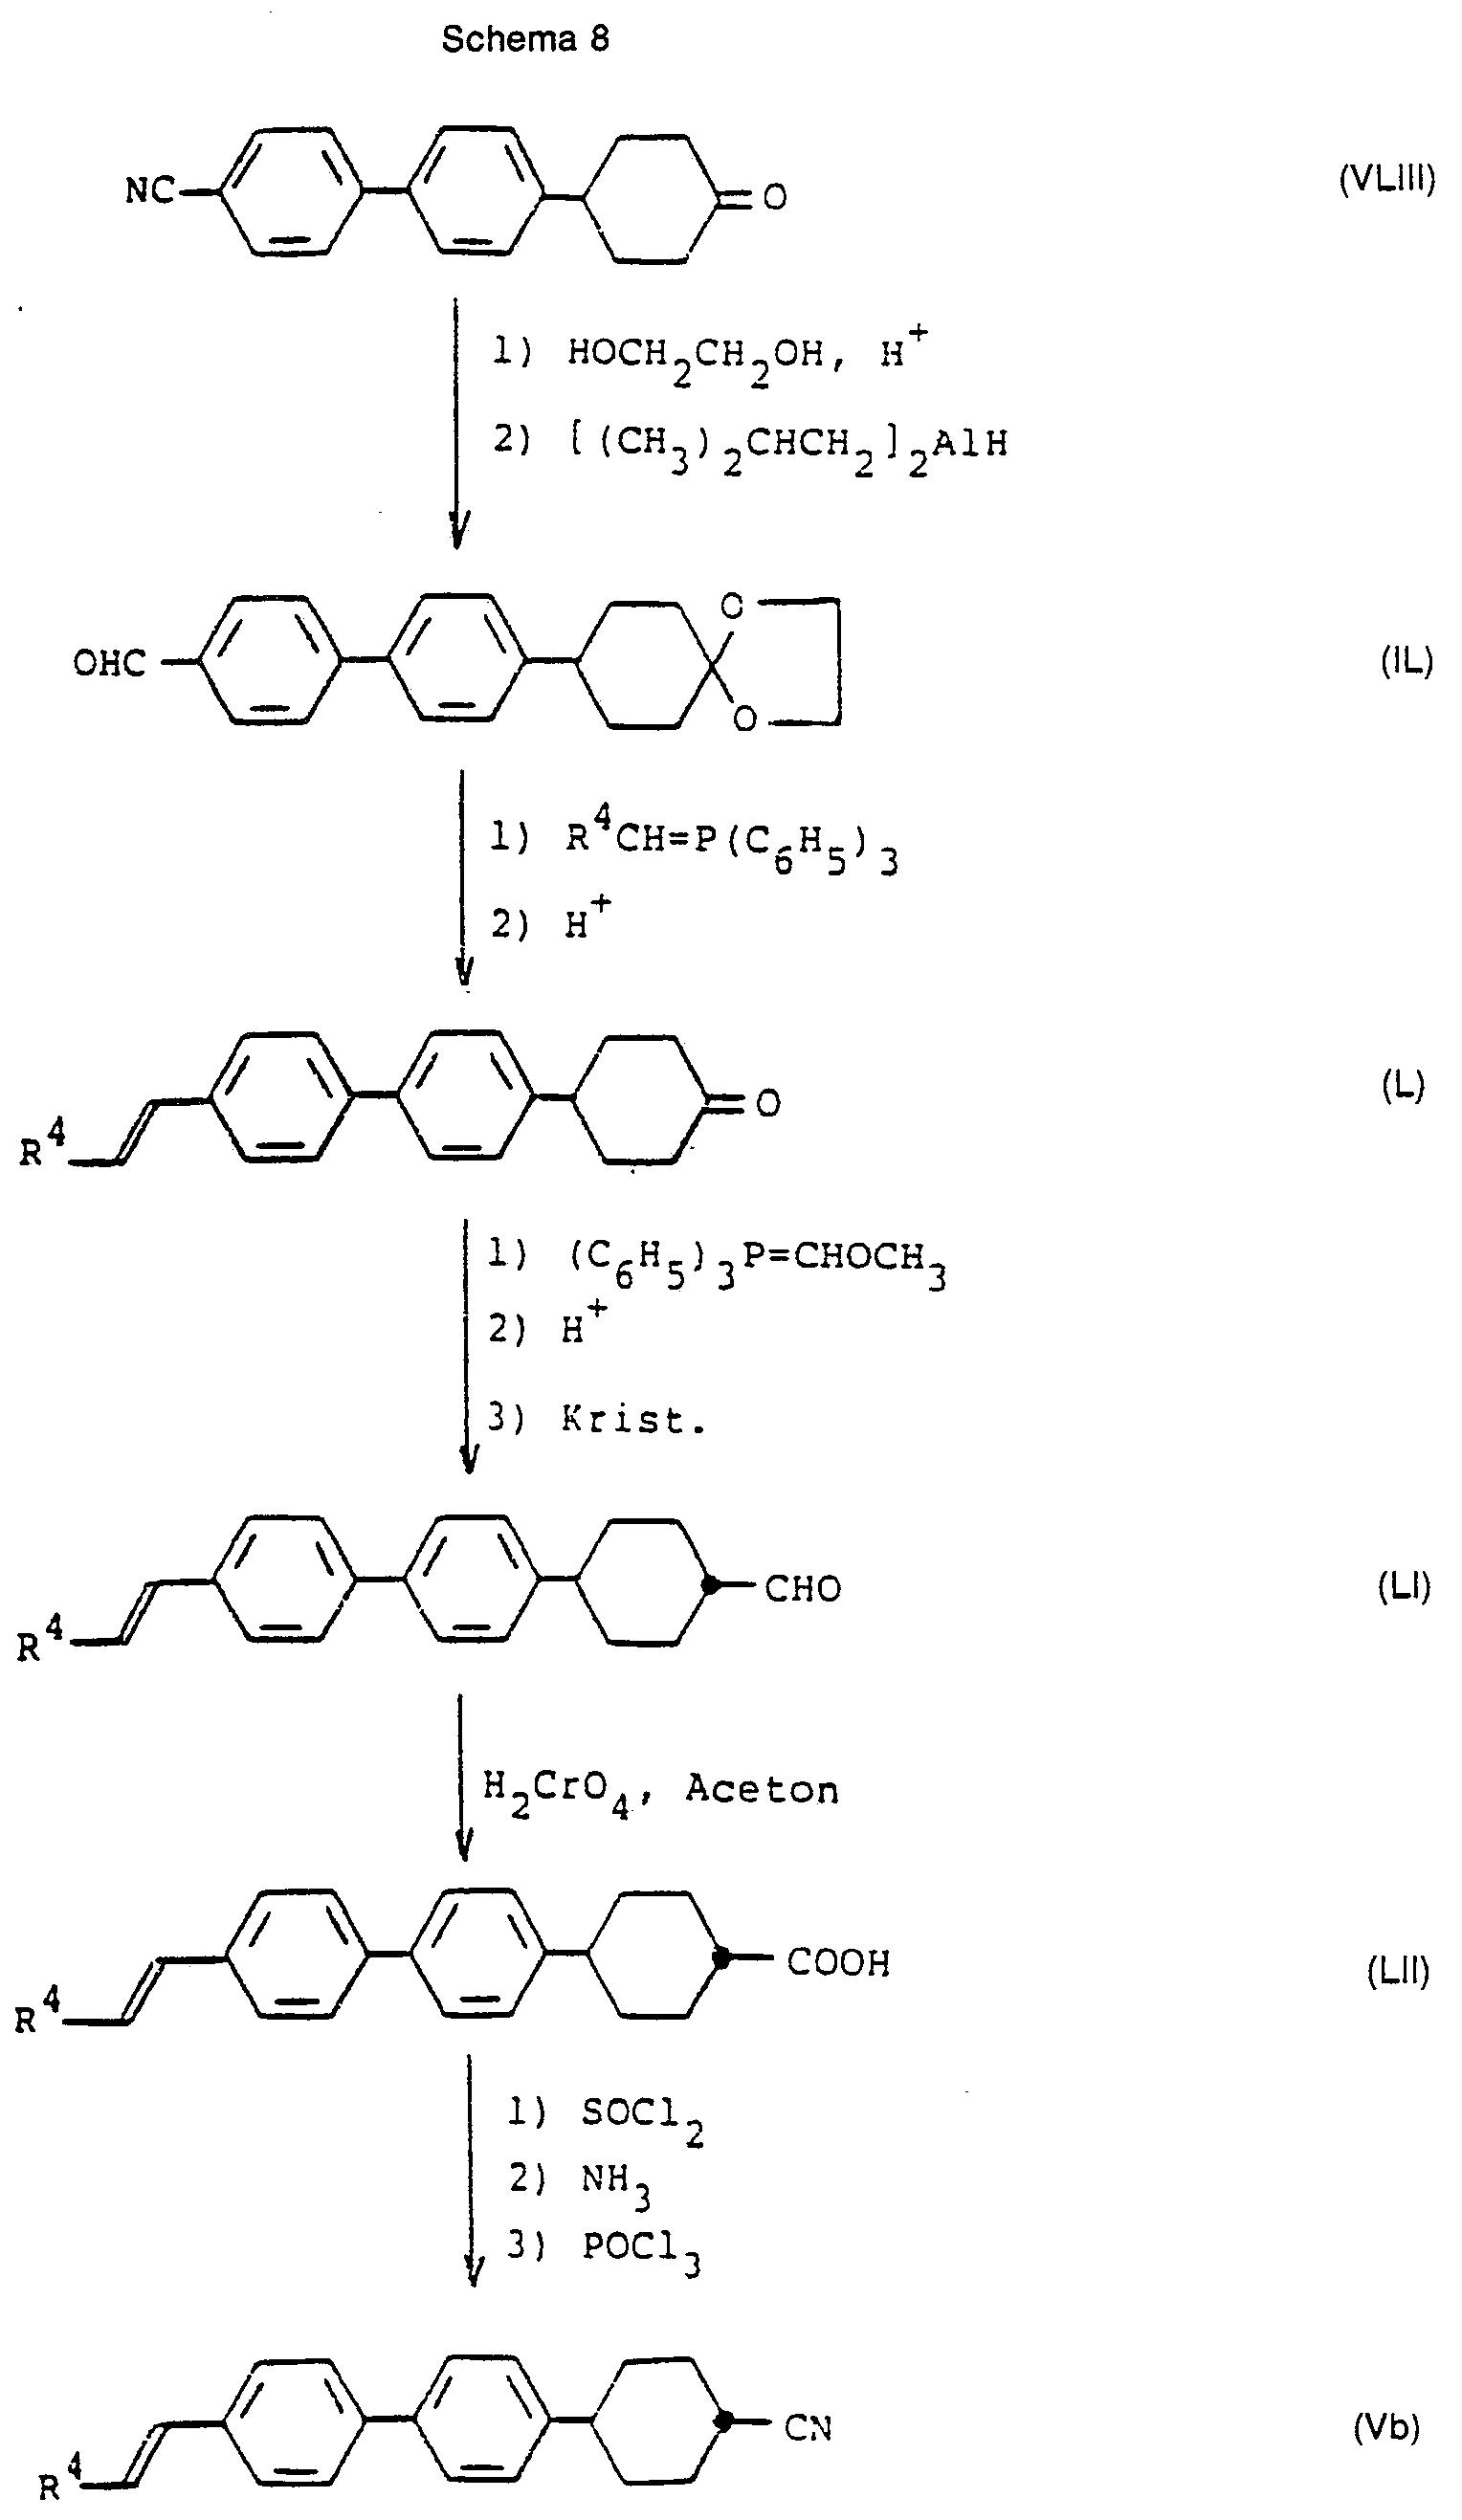 EP0172360B1 - Cyclohexanecarbonitriles and their use as